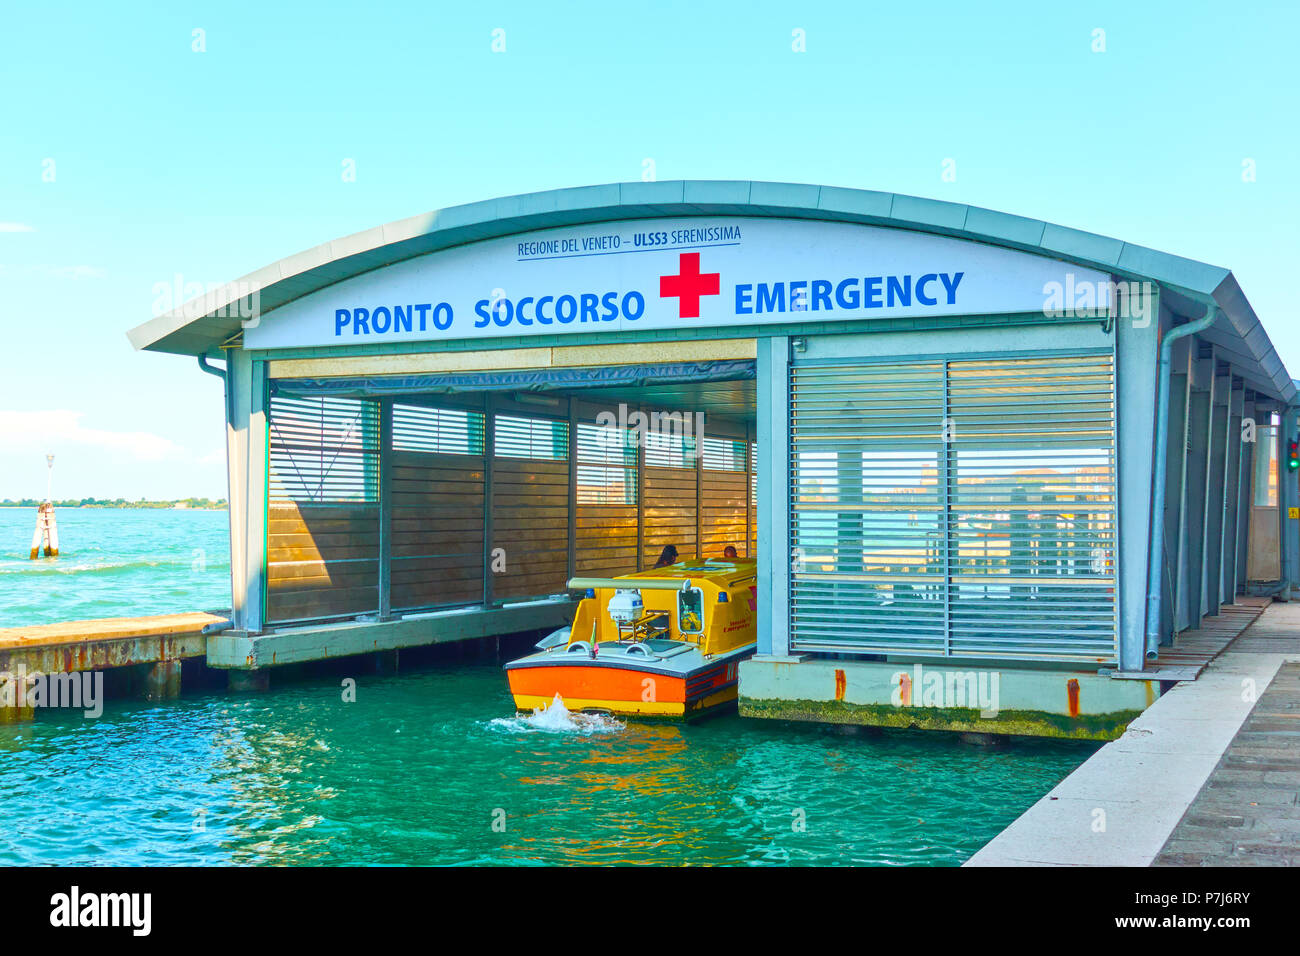 Venice, Italy - June 18, 2018:  Emergency medical service boat station  - Pronto Soccorso (it.) Stock Photo